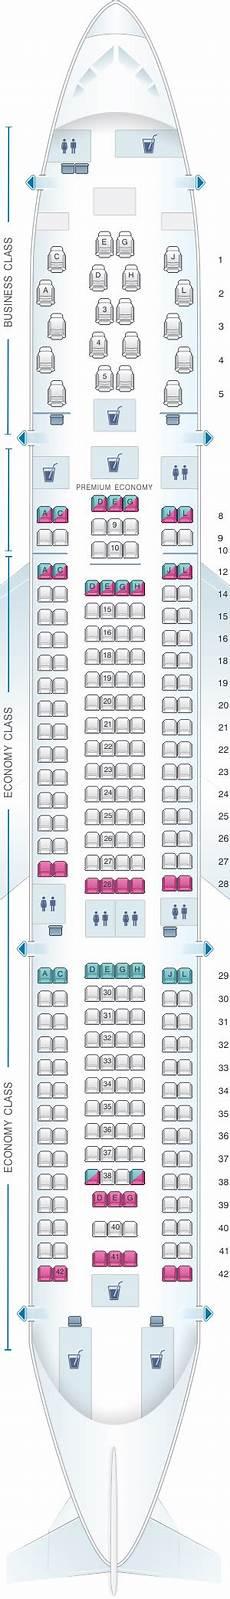 Alitalia Flight 631 Seating Chart Plan De Cabine Alitalia Airlines Air One Airbus A330 200